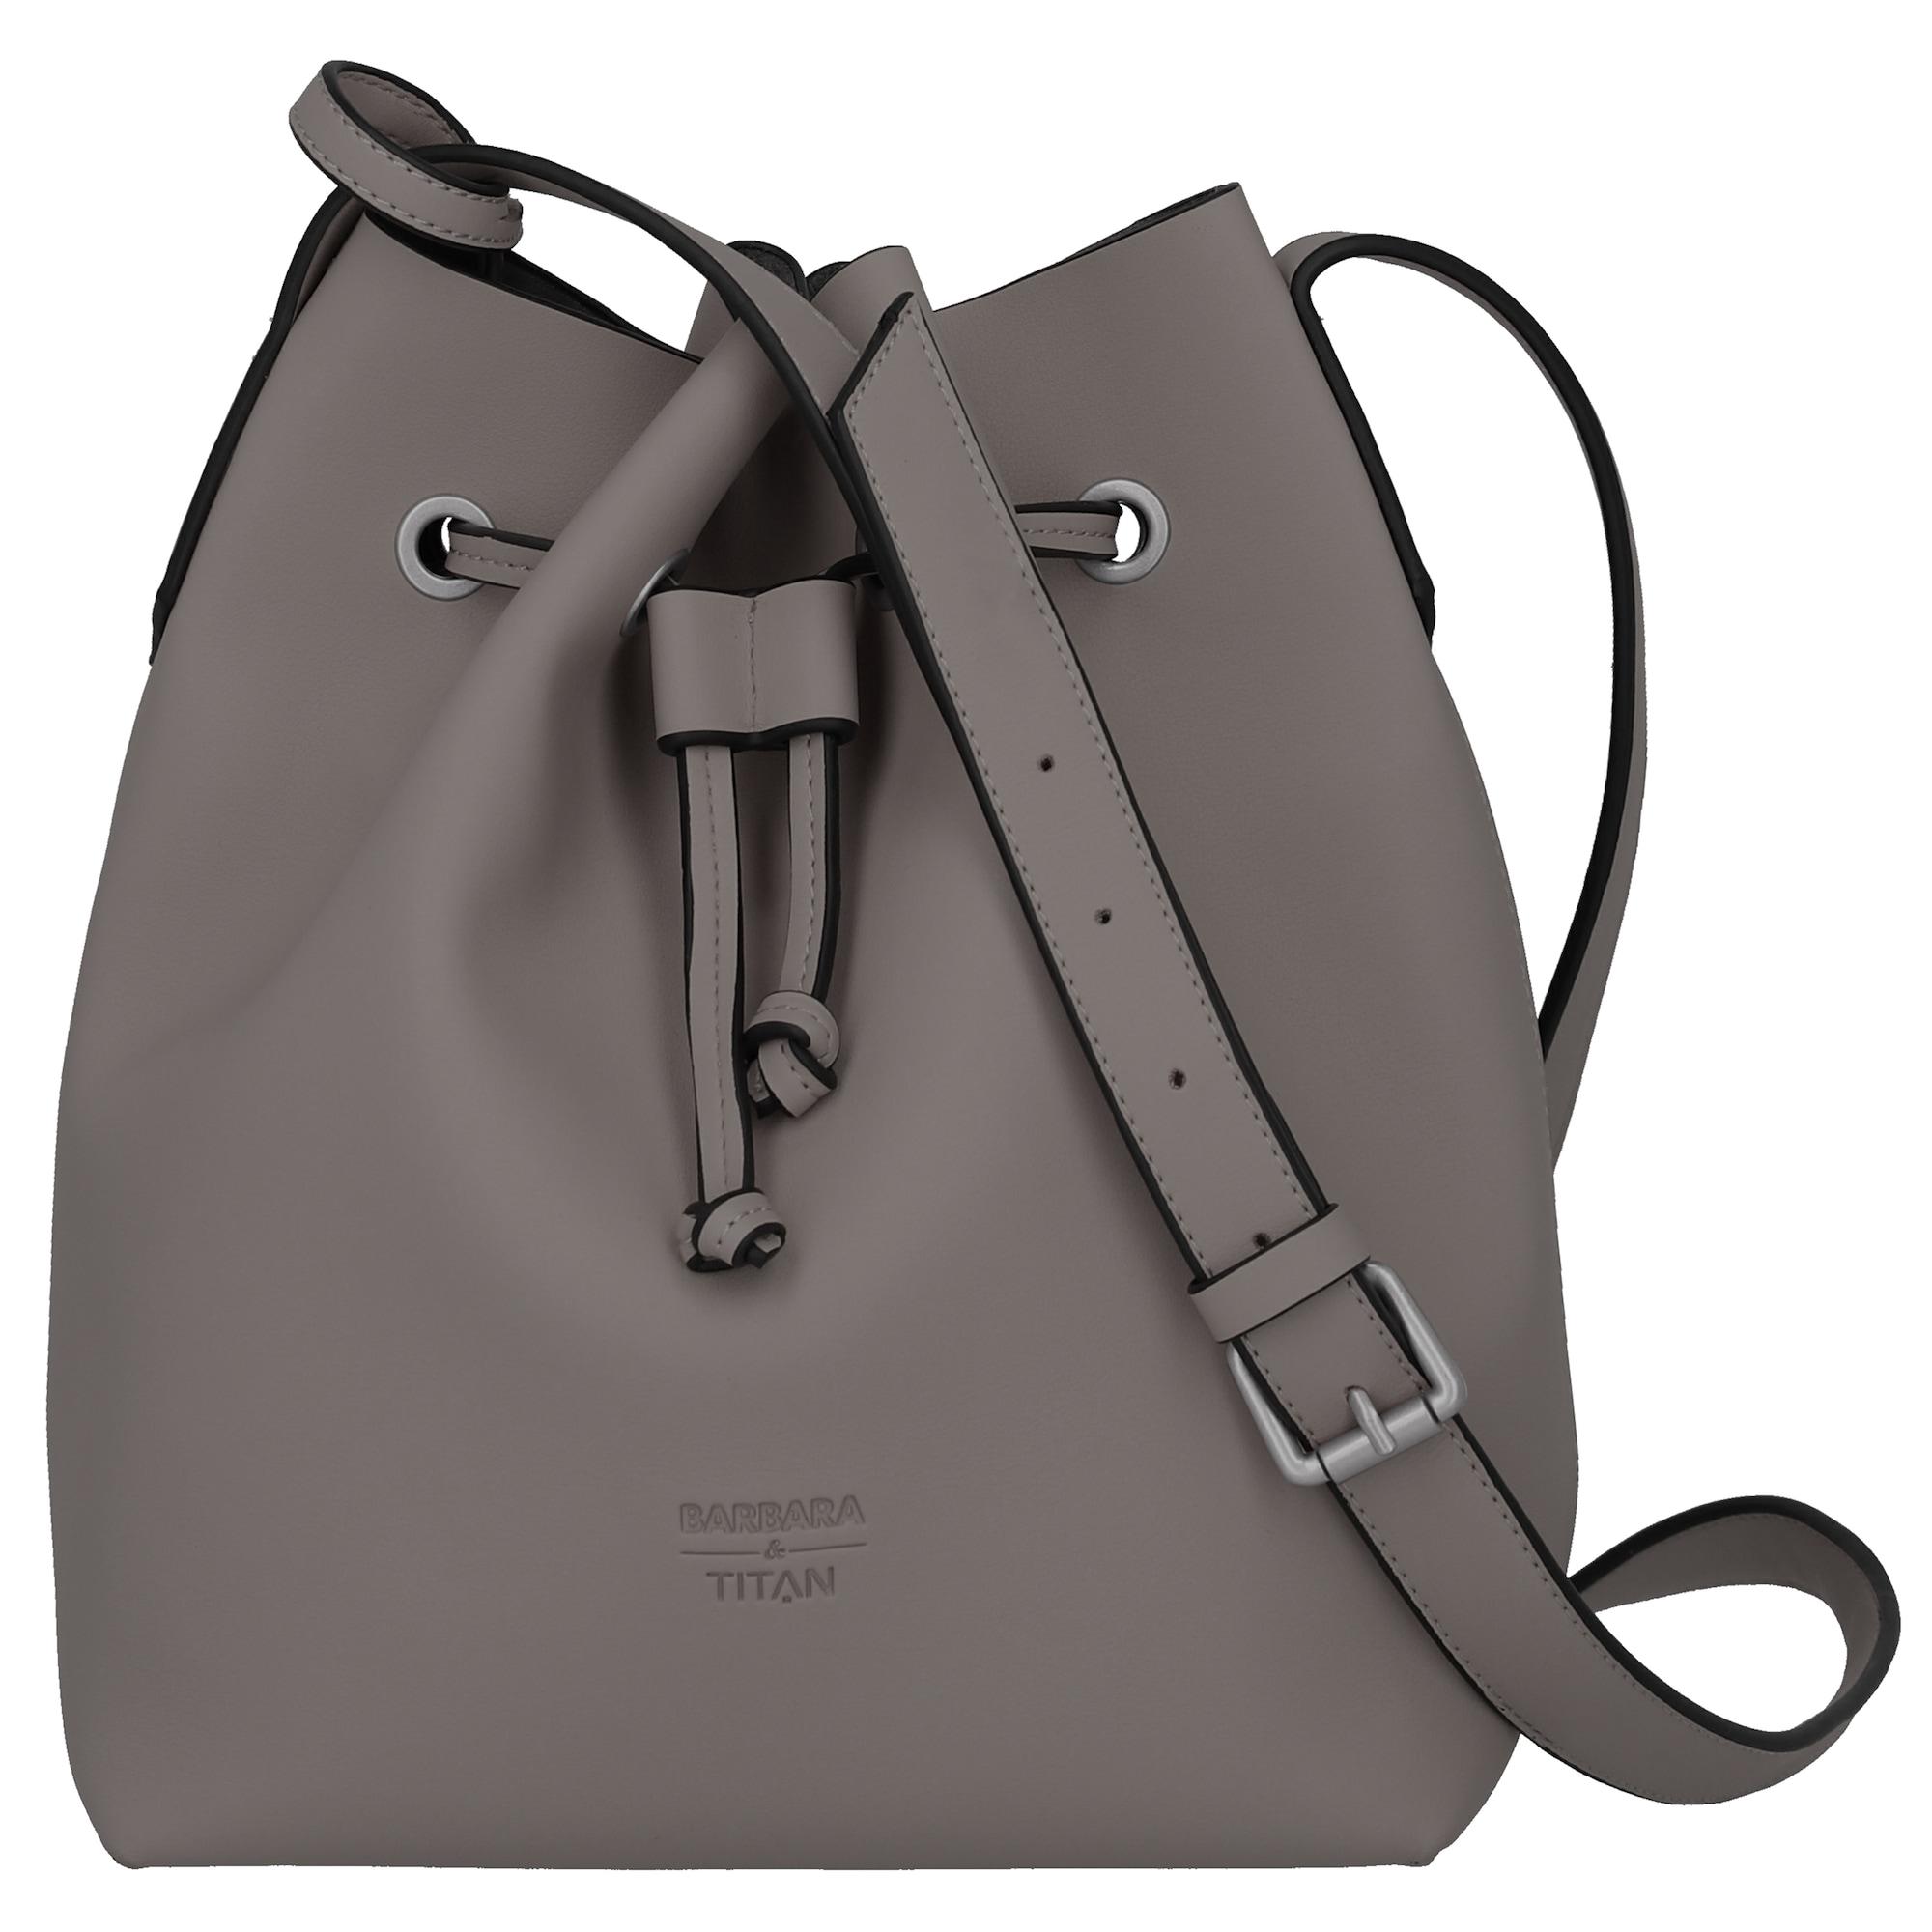 Beuteltasche   Taschen > Handtaschen > Beuteltaschen   Titan